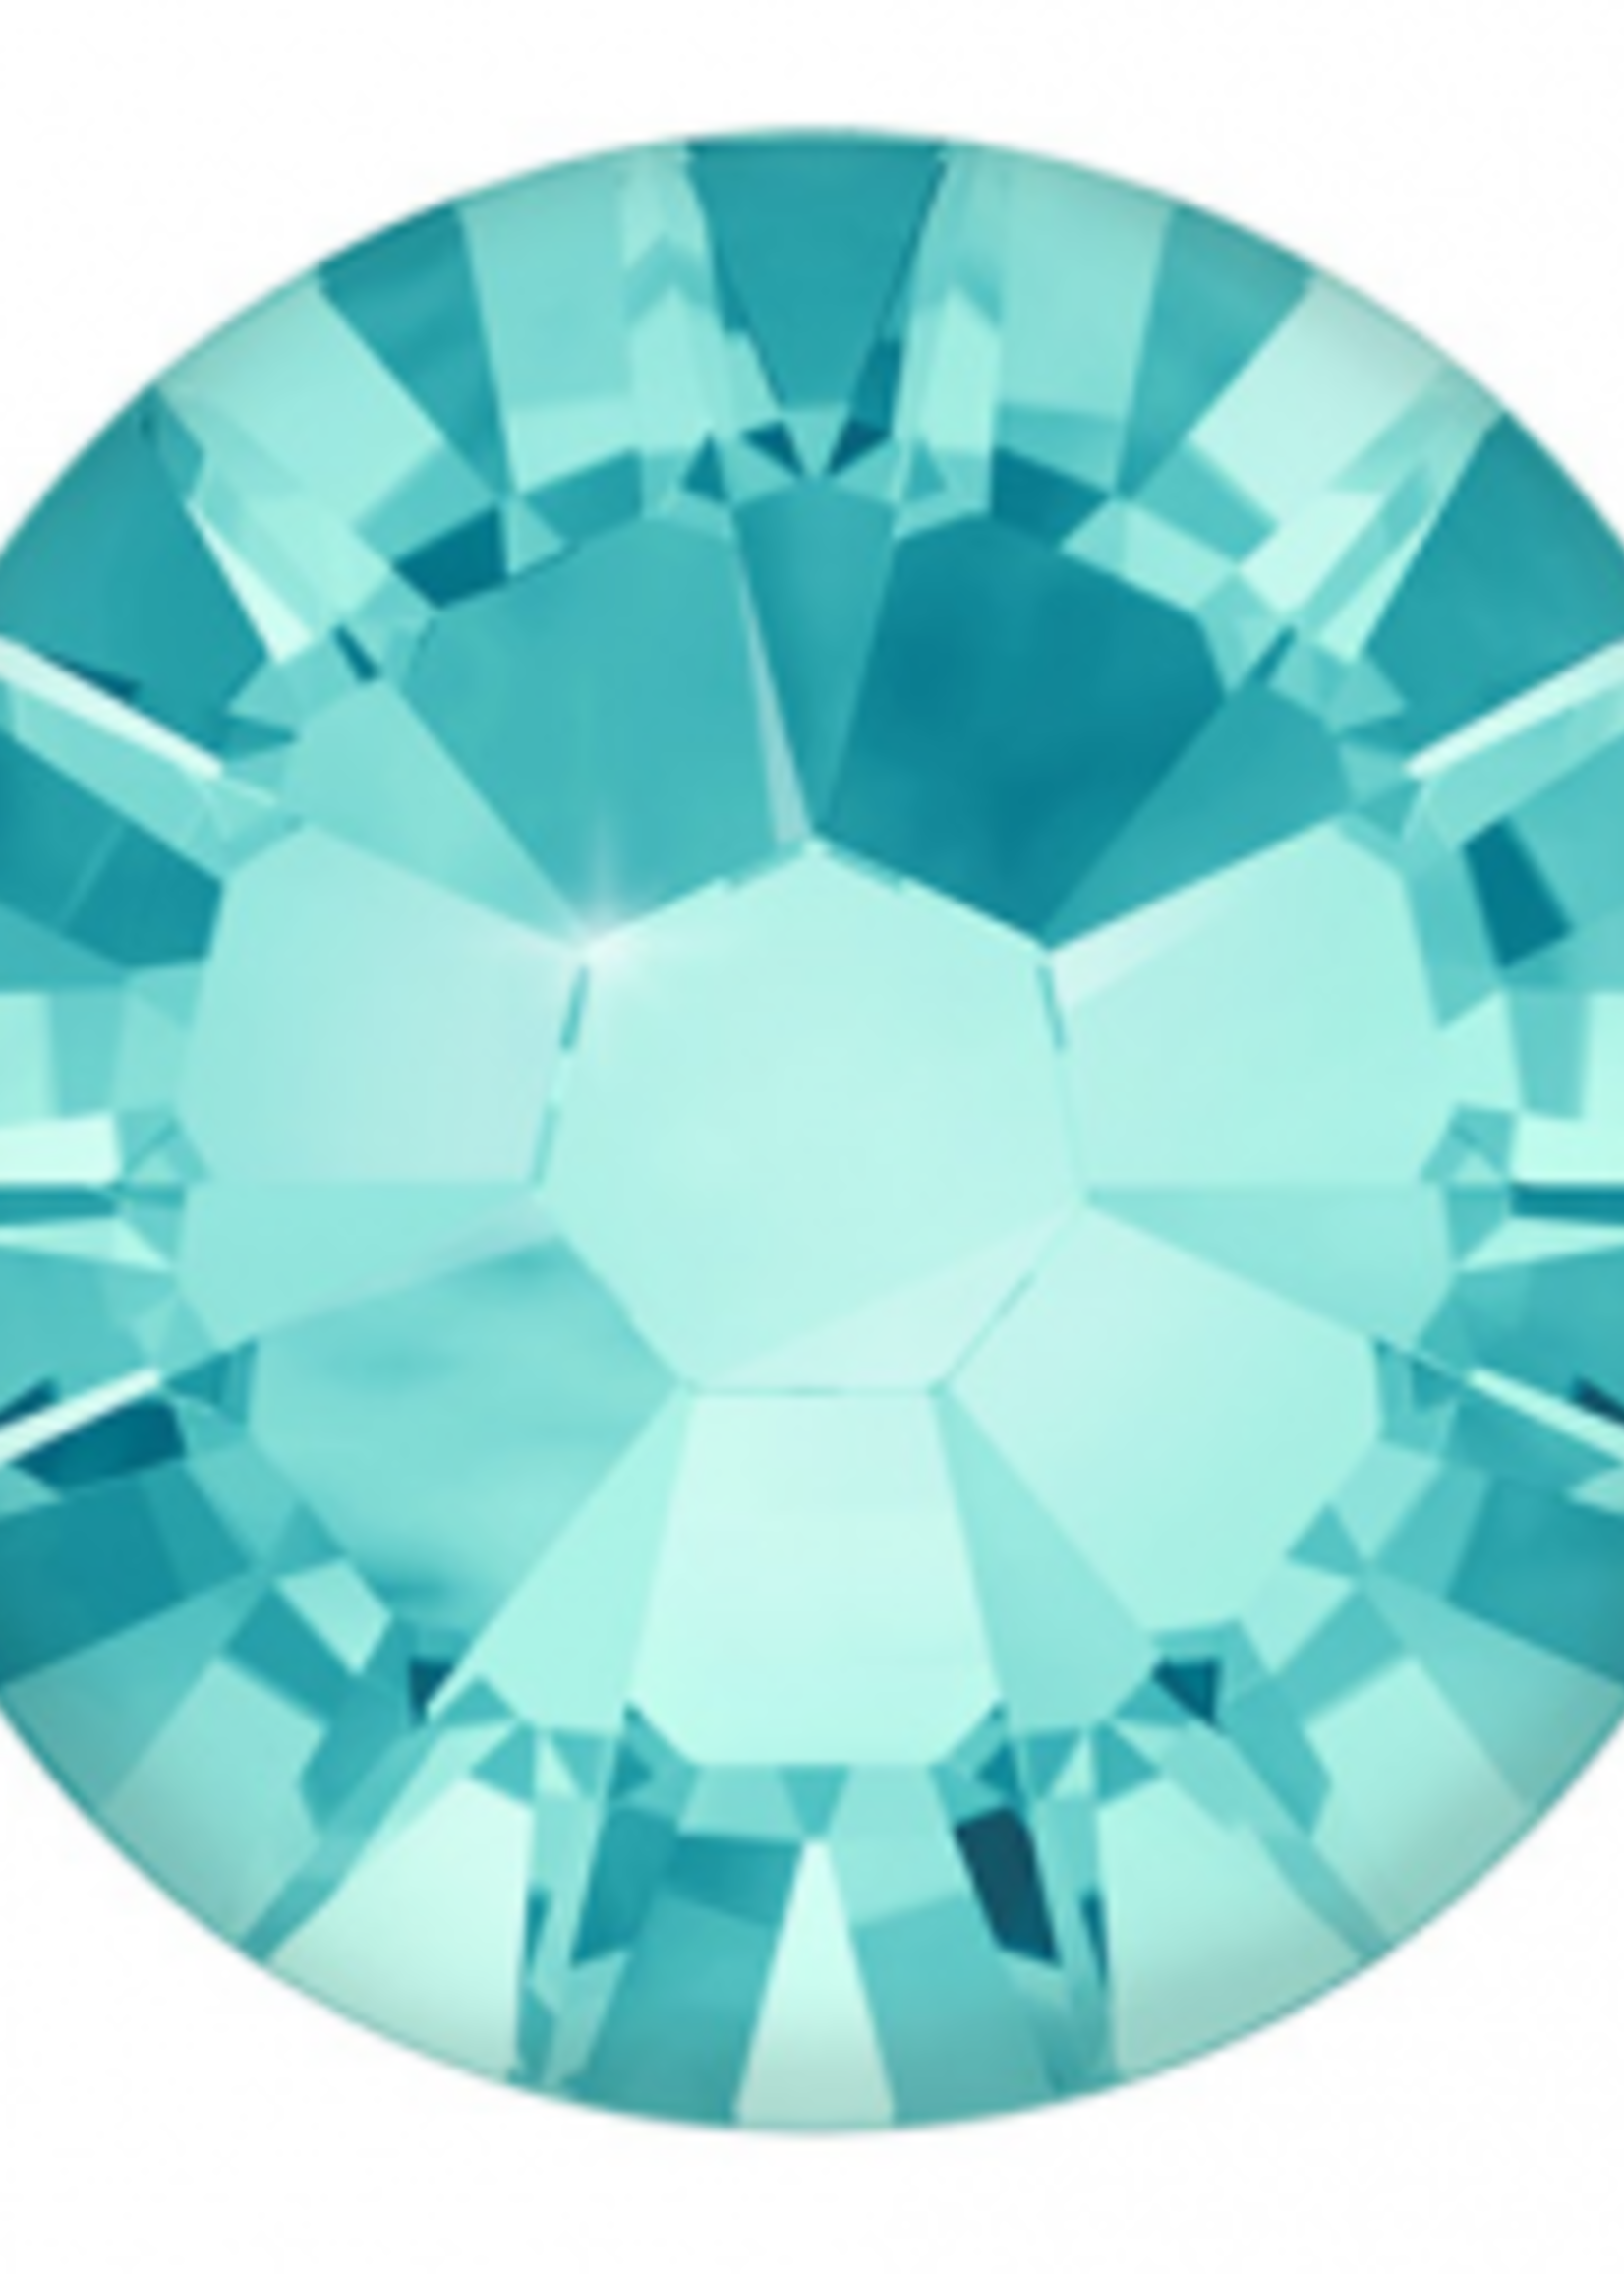 Swarovski Swarovski Crystal Light Turquoise 2.15 mm